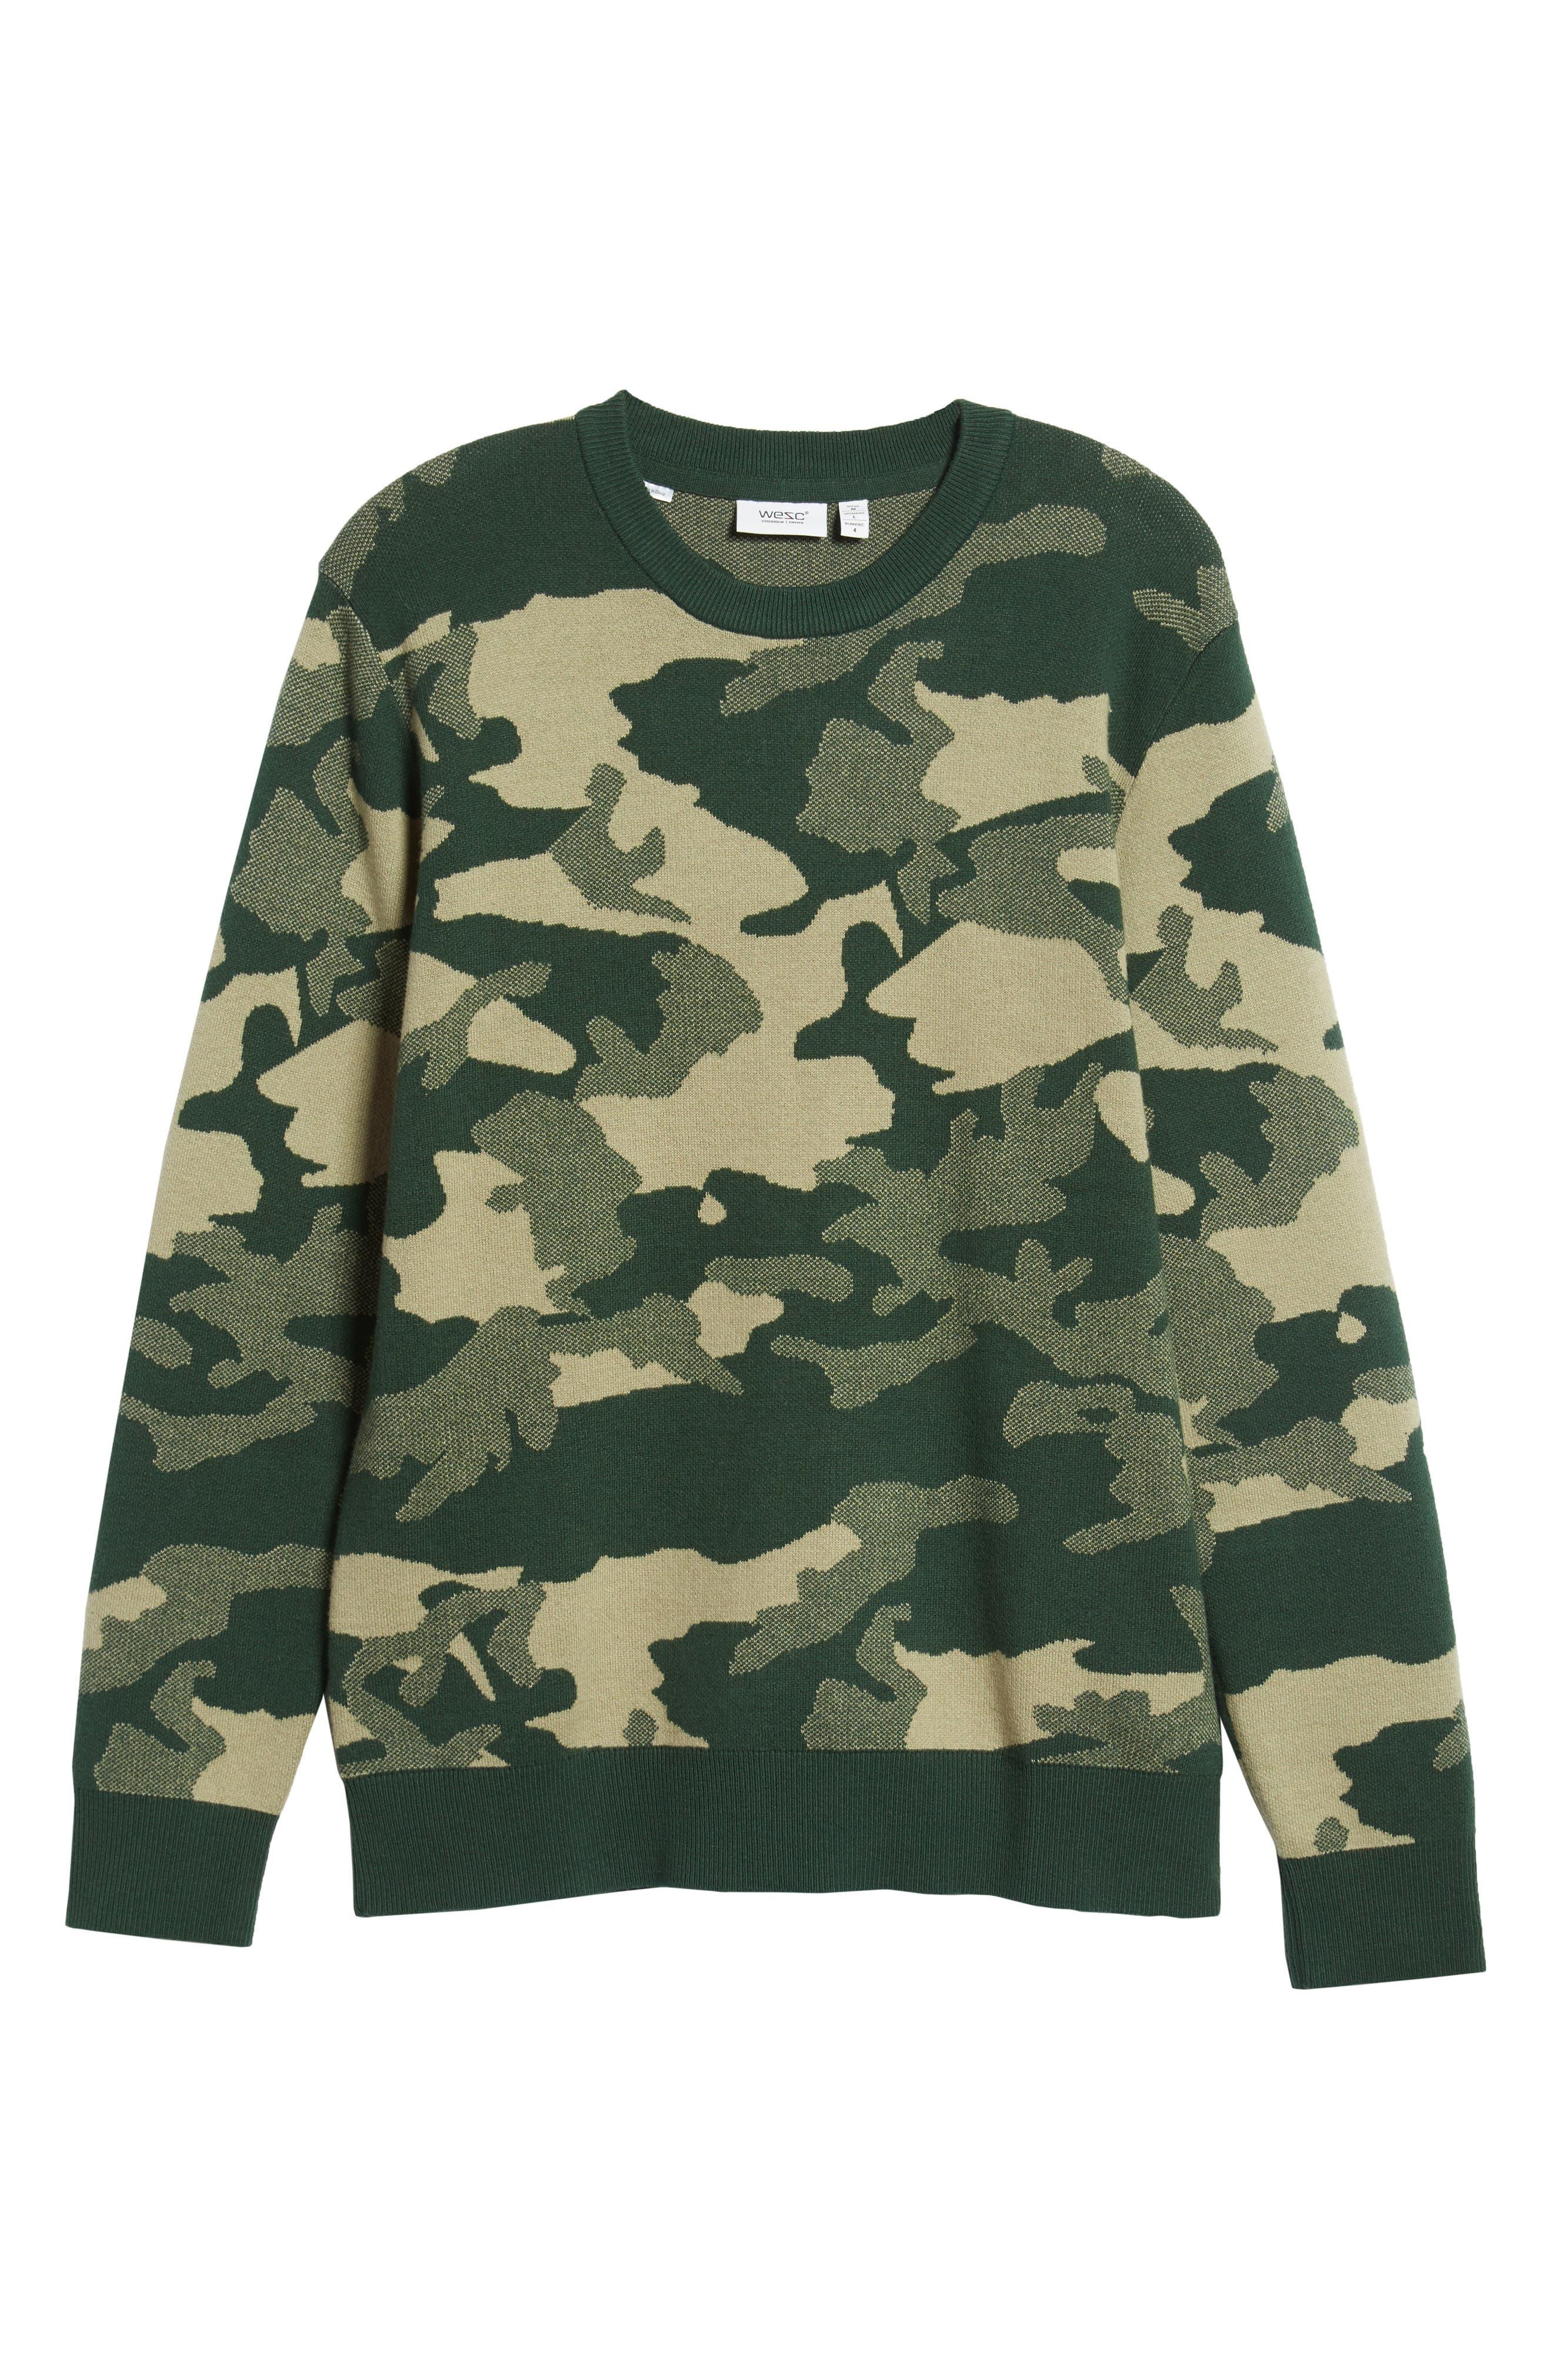 Anwar Camo Crewneck Sweater,                             Alternate thumbnail 6, color,                             PEAKS WOODLAND